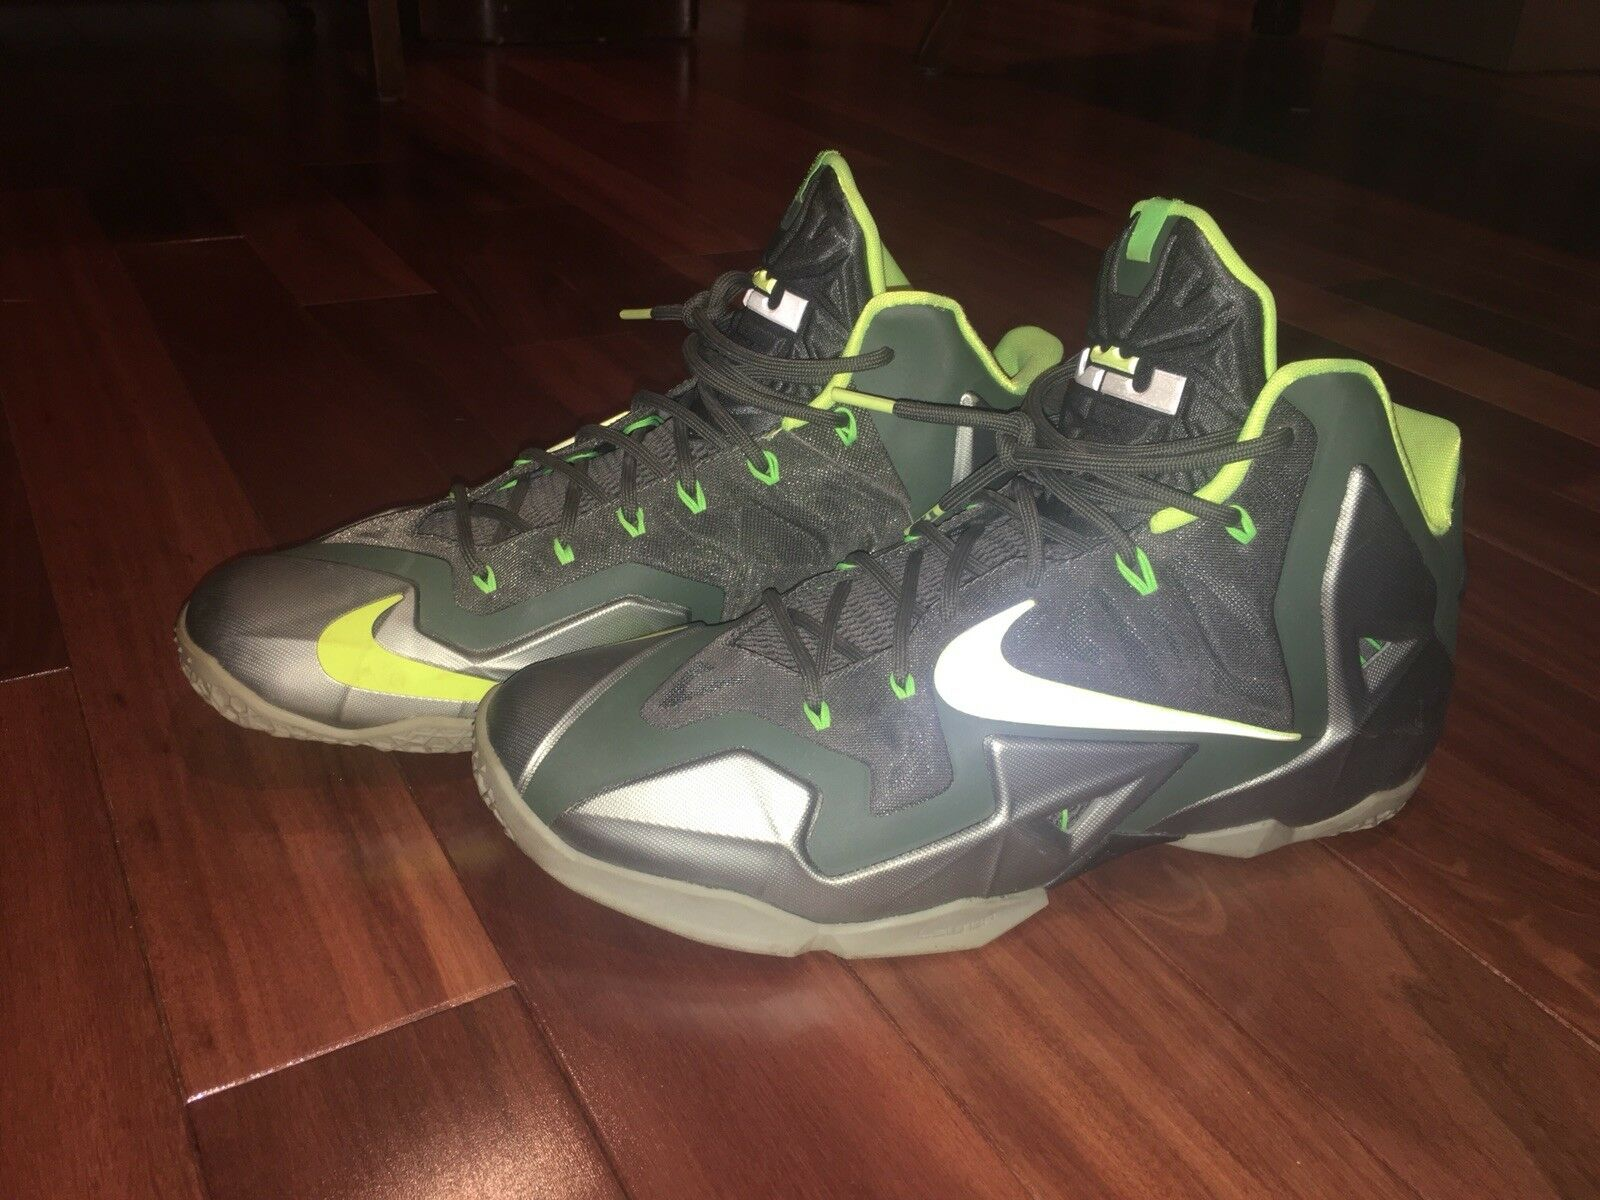 ff08477dc155d New Nike Lebron 11 11 11 XI Size 12 Dunkman Green Volt Basketball Shoe  616175- Nike Air Jordan 2 Retro Black ...